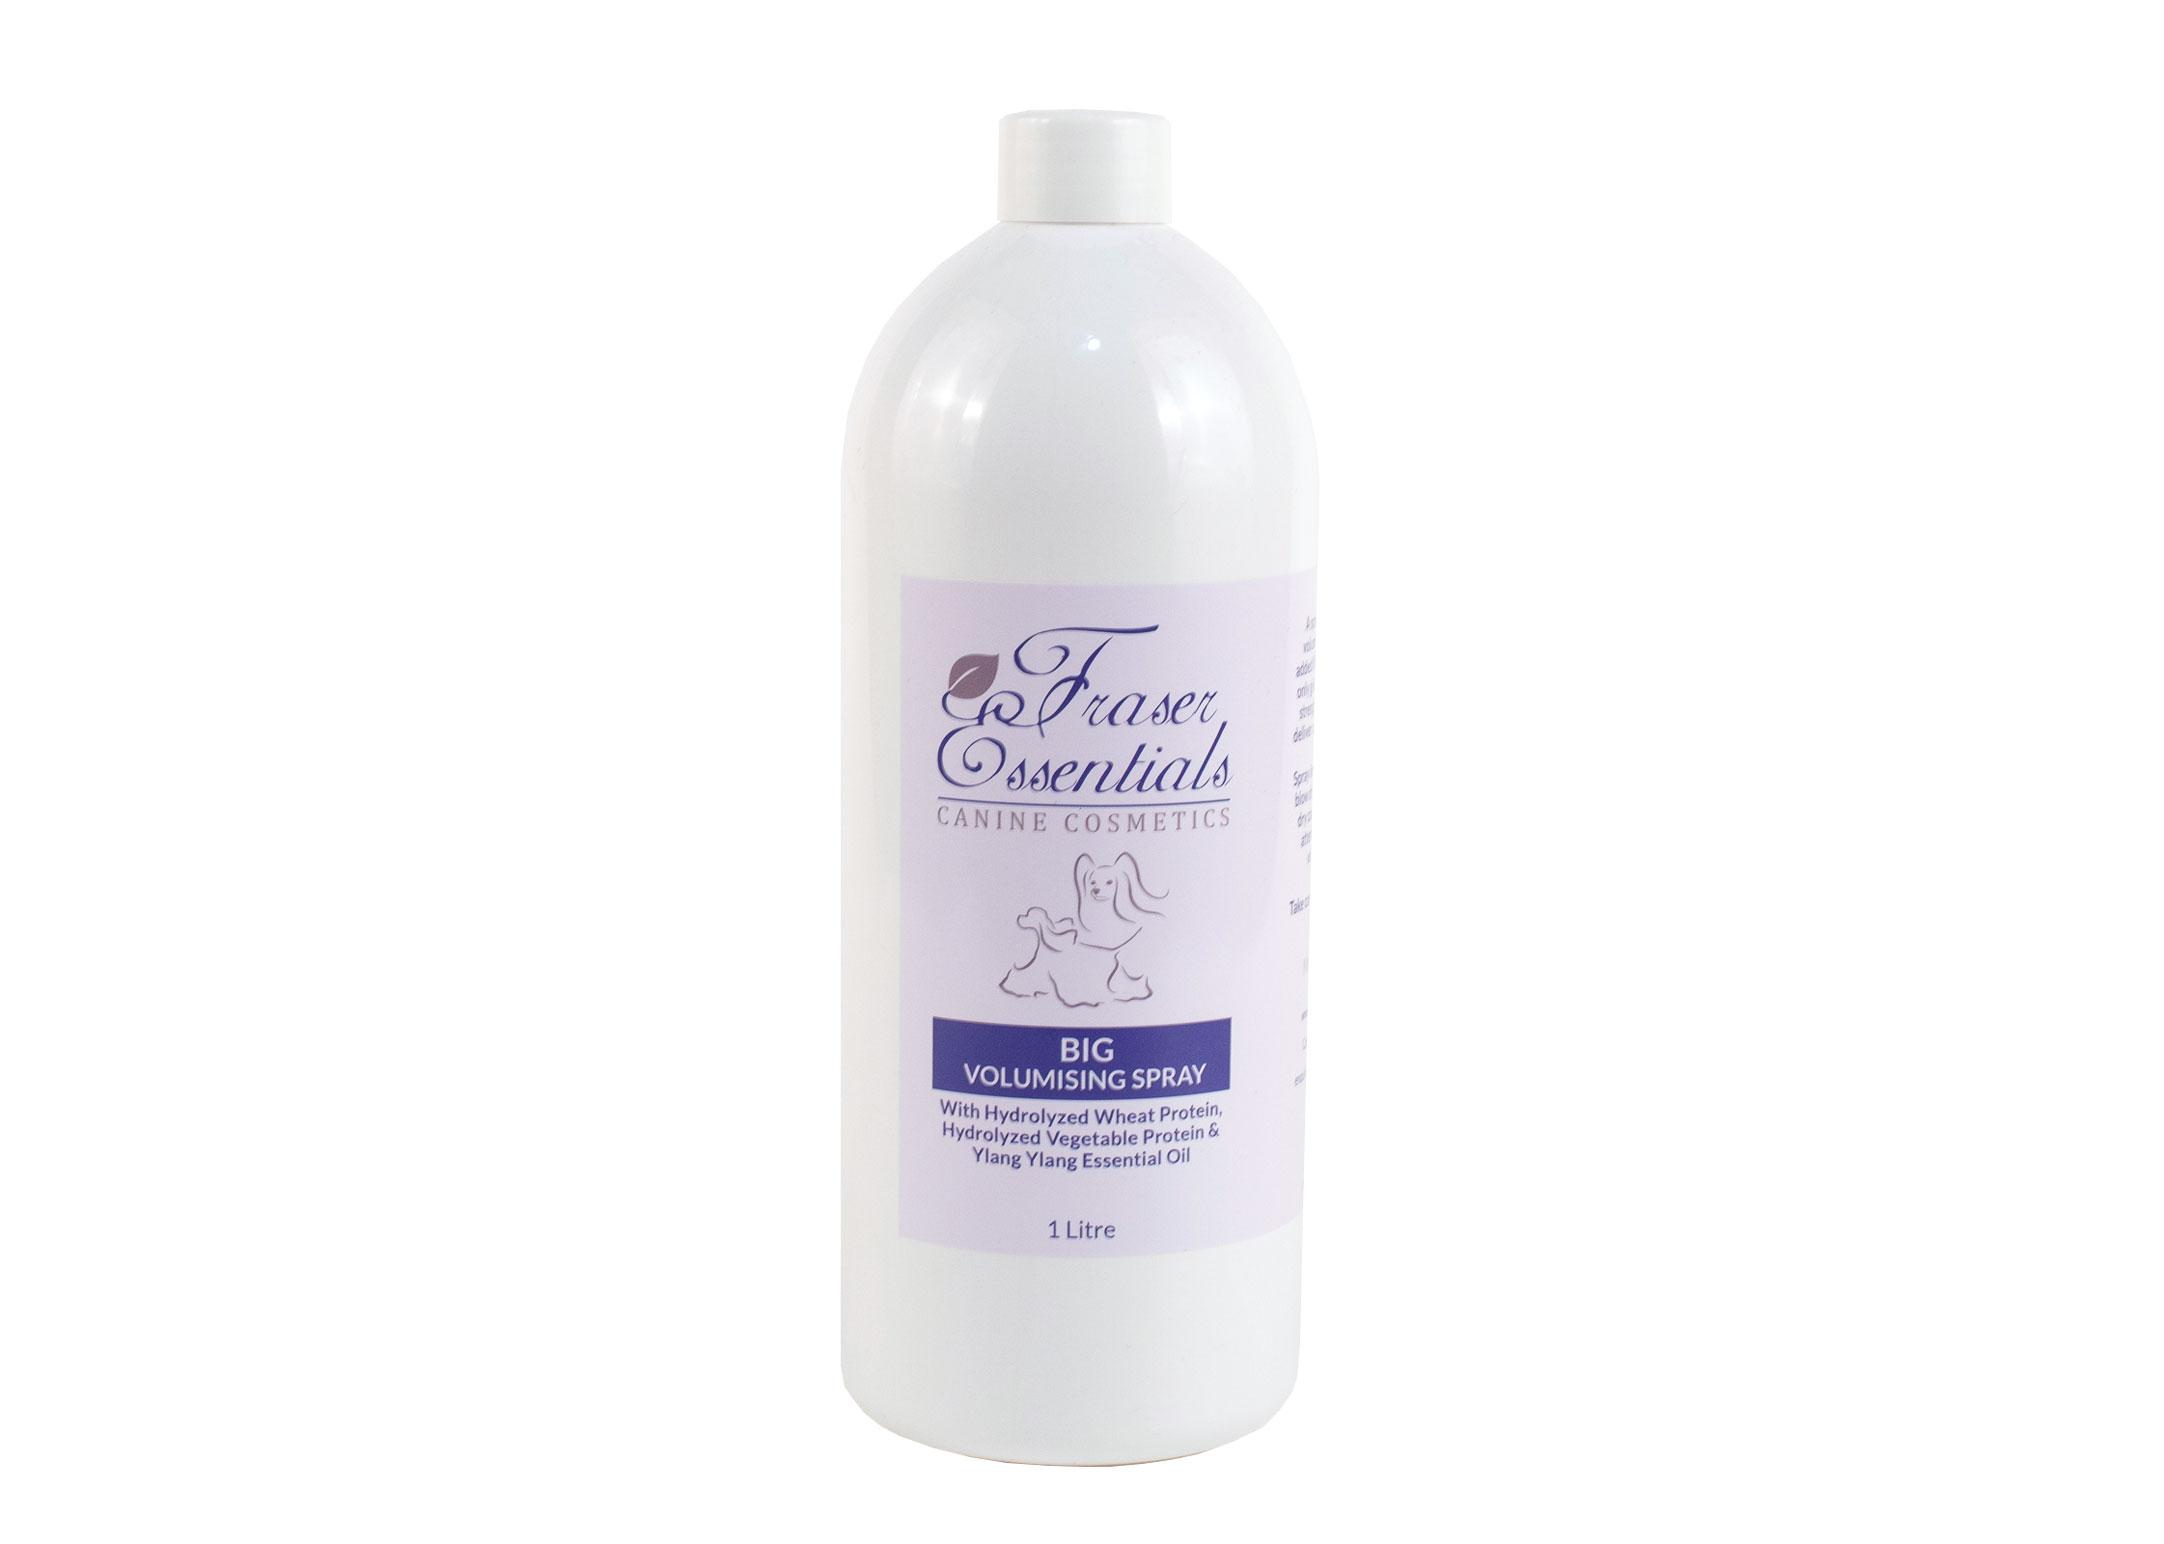 Fraser Essentials BIG Conditioner Spray - volumising